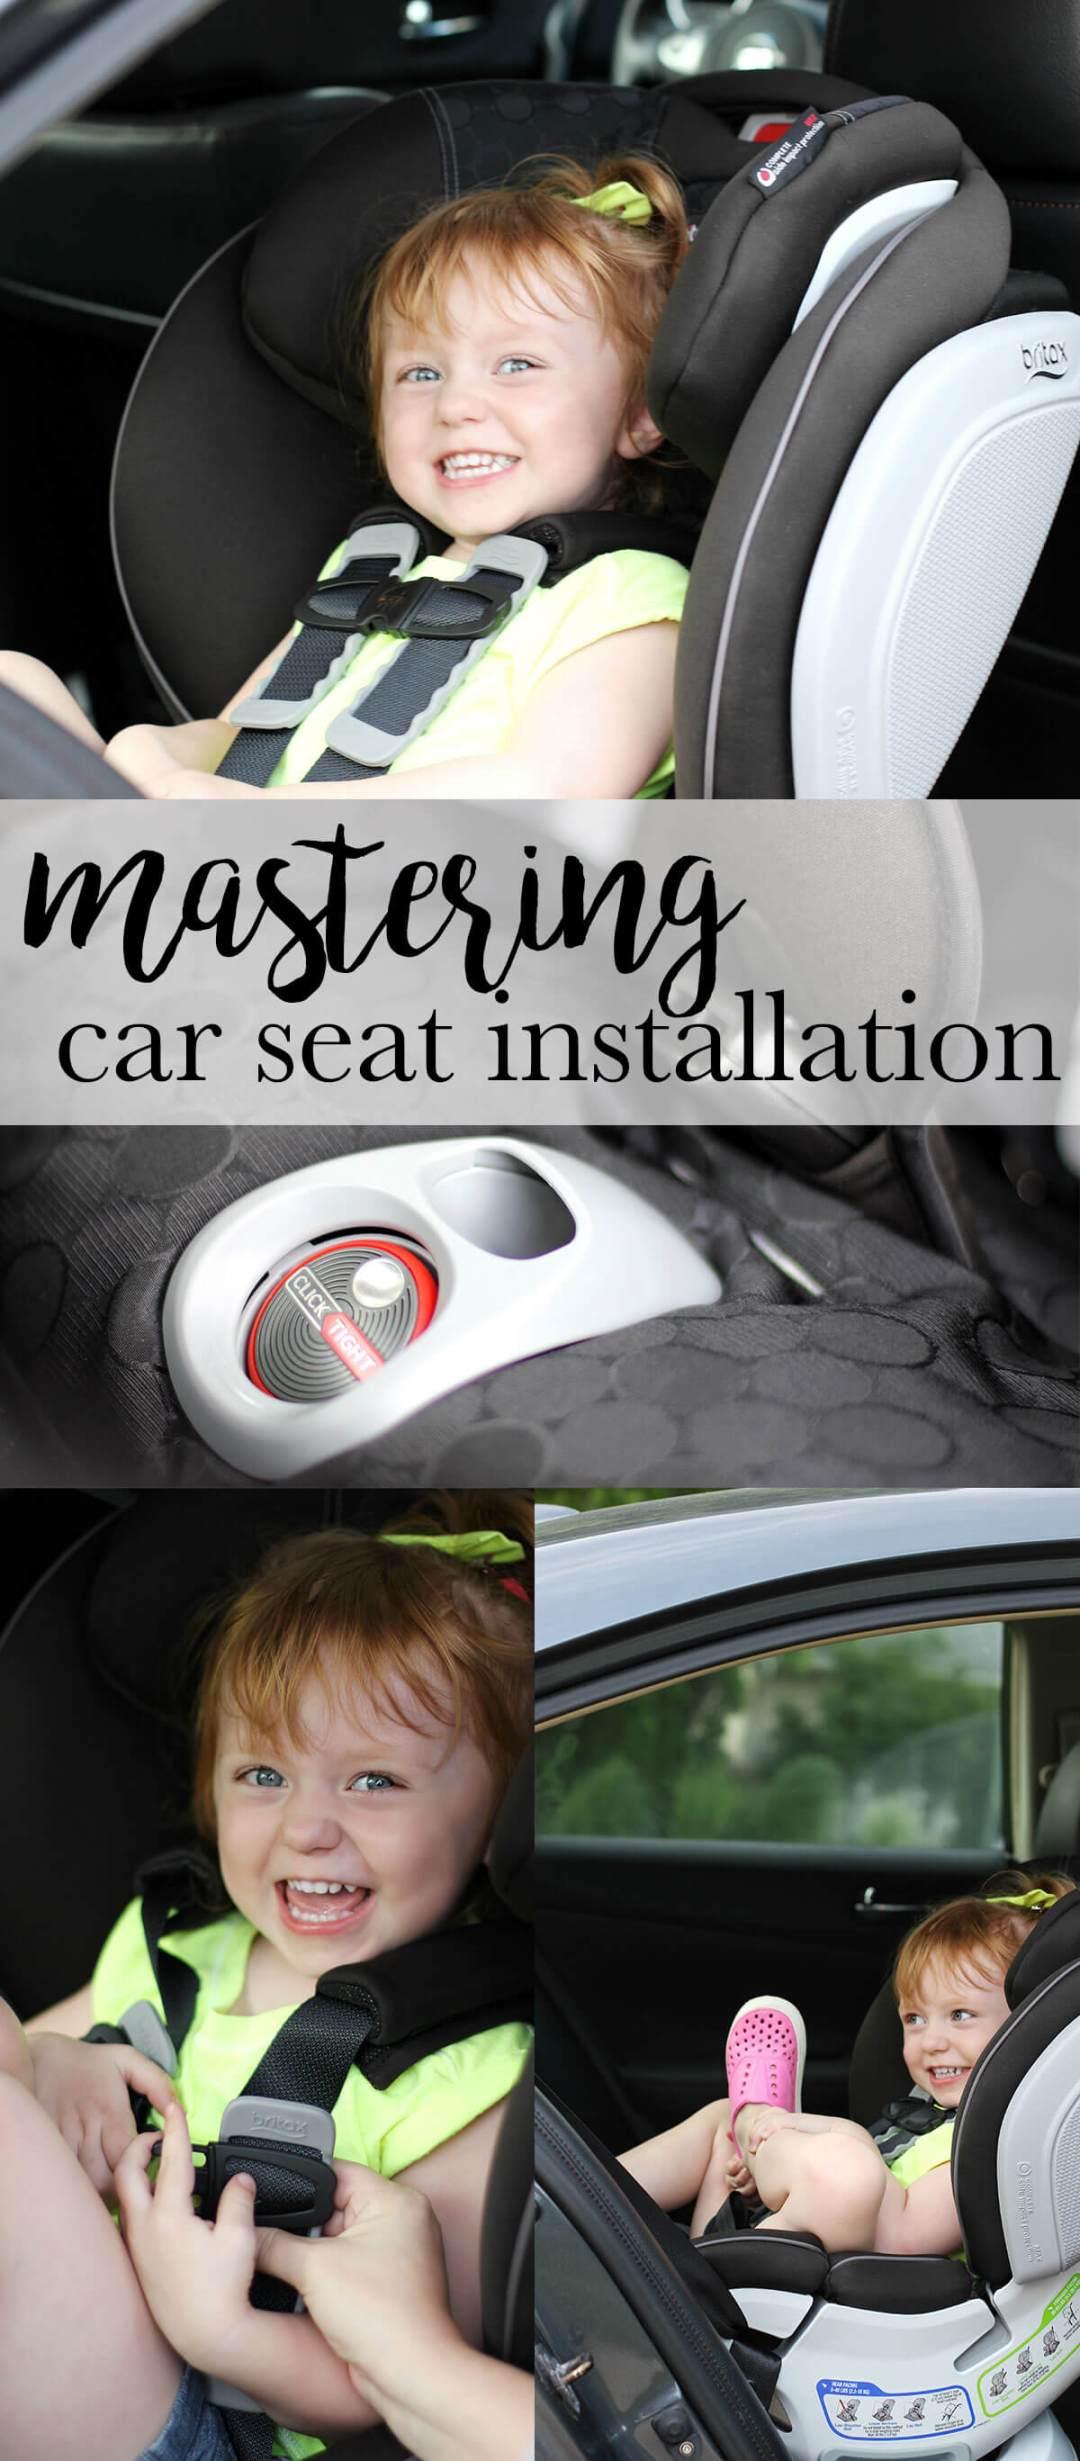 Mastering Safe Car Seat Installation